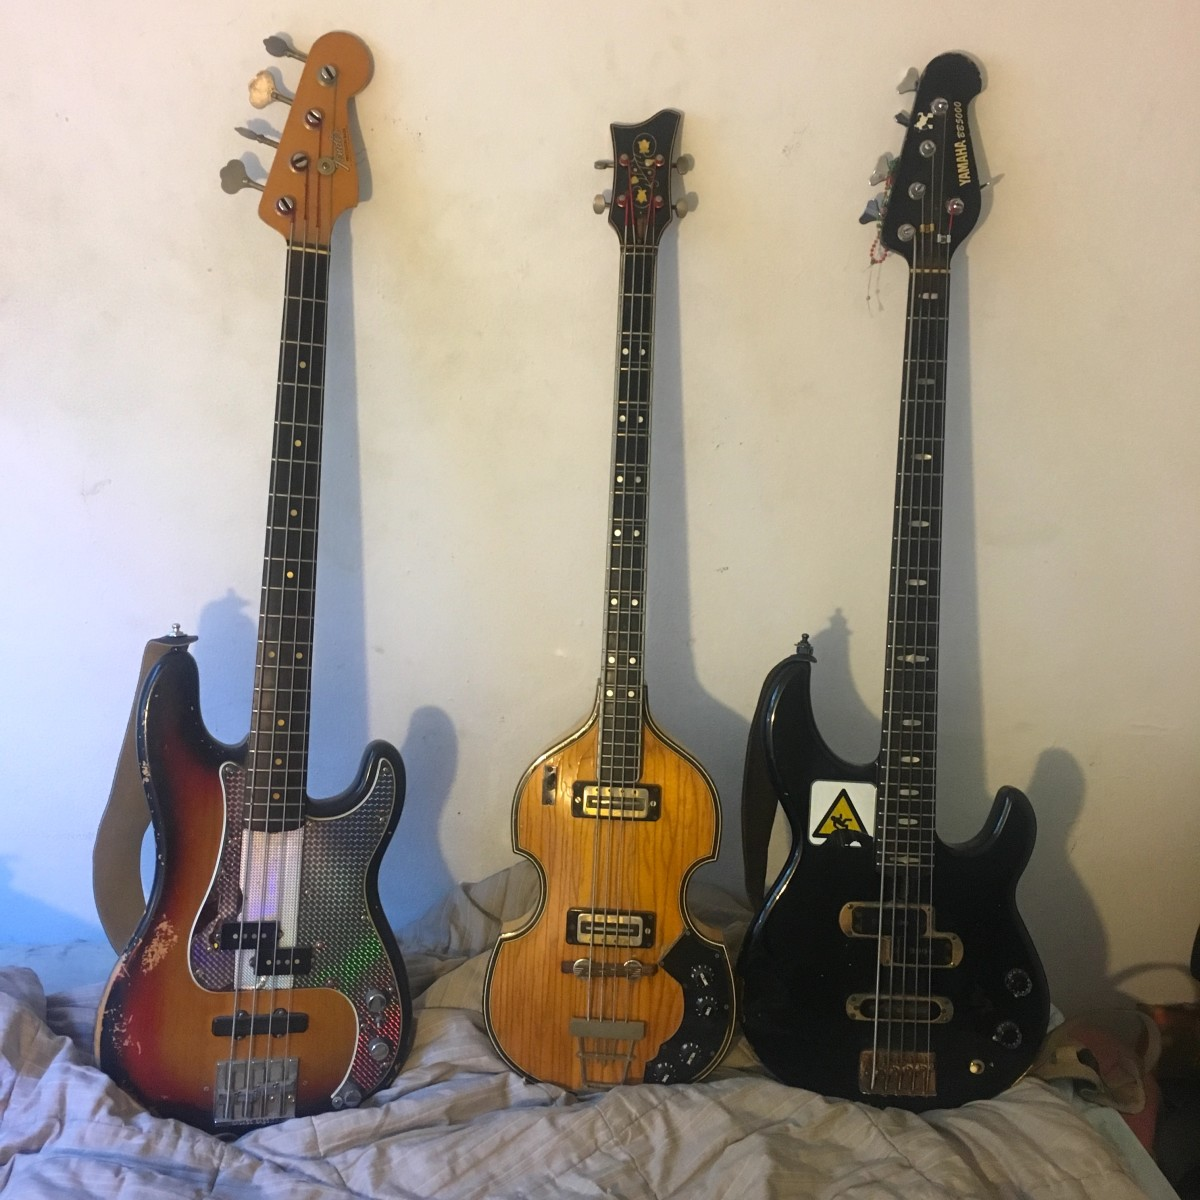 Steinberg's 1973 Fender Precision, 1962 Hofner, andYamaha BB5000